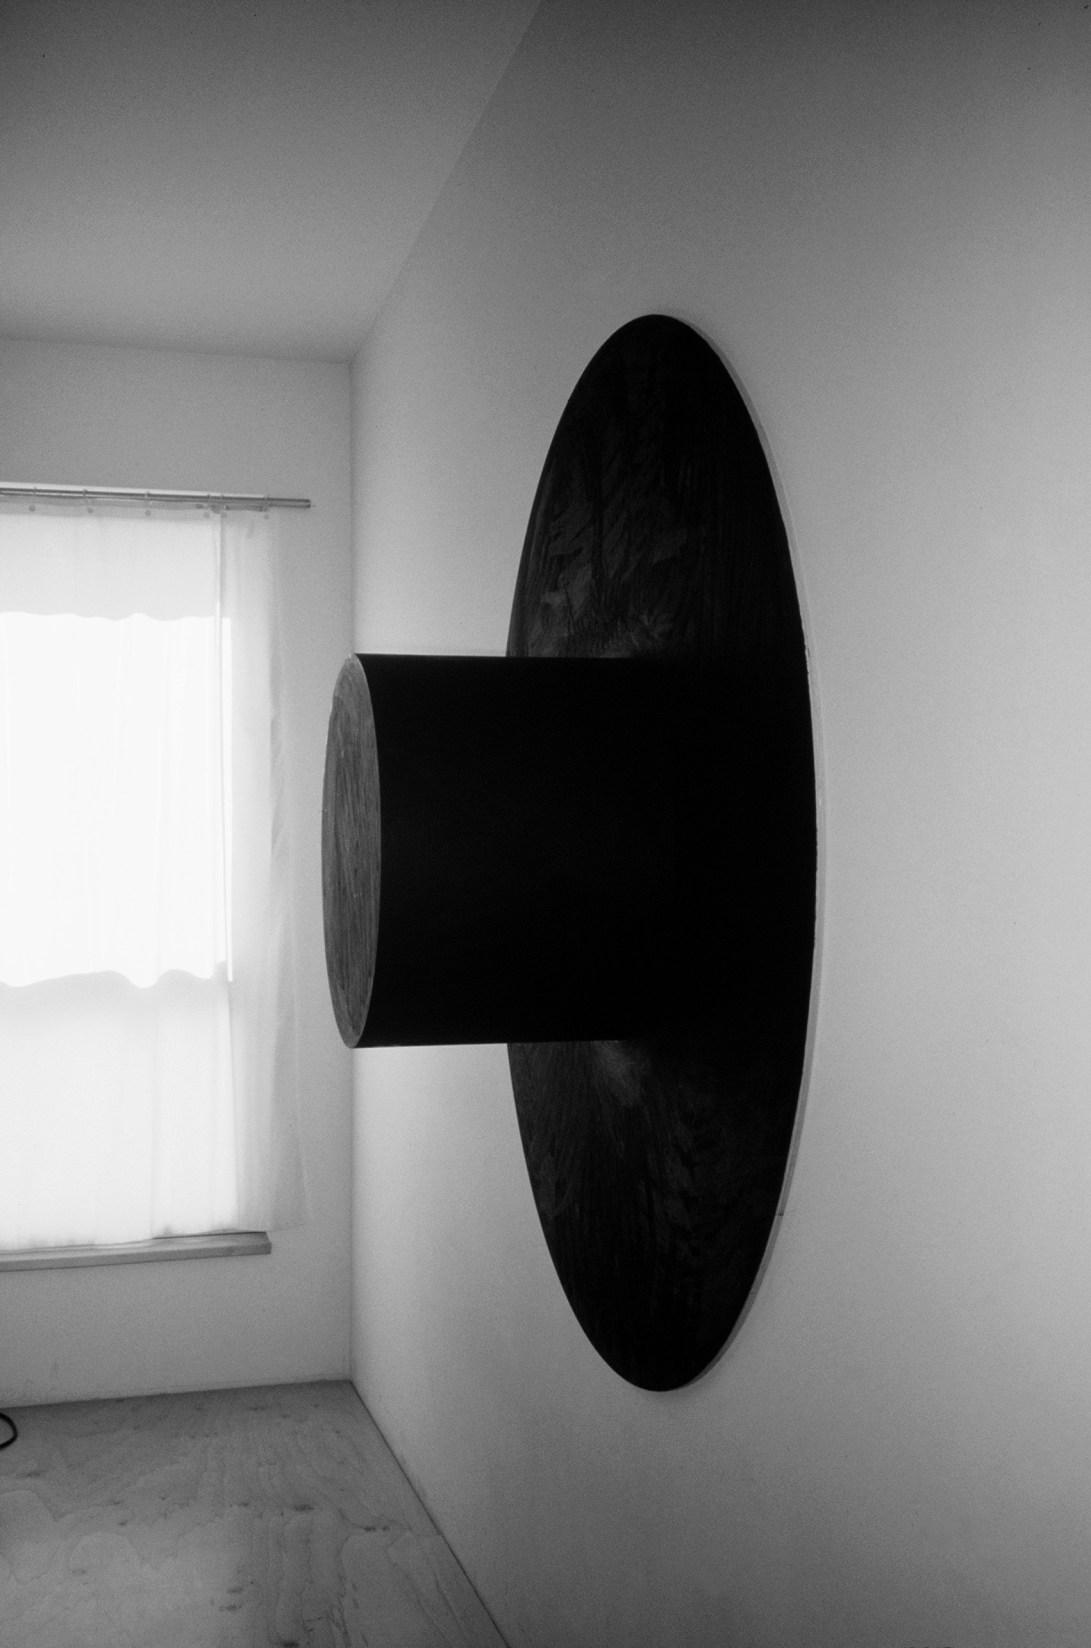 Sculpture 1, Untitled (Blk)